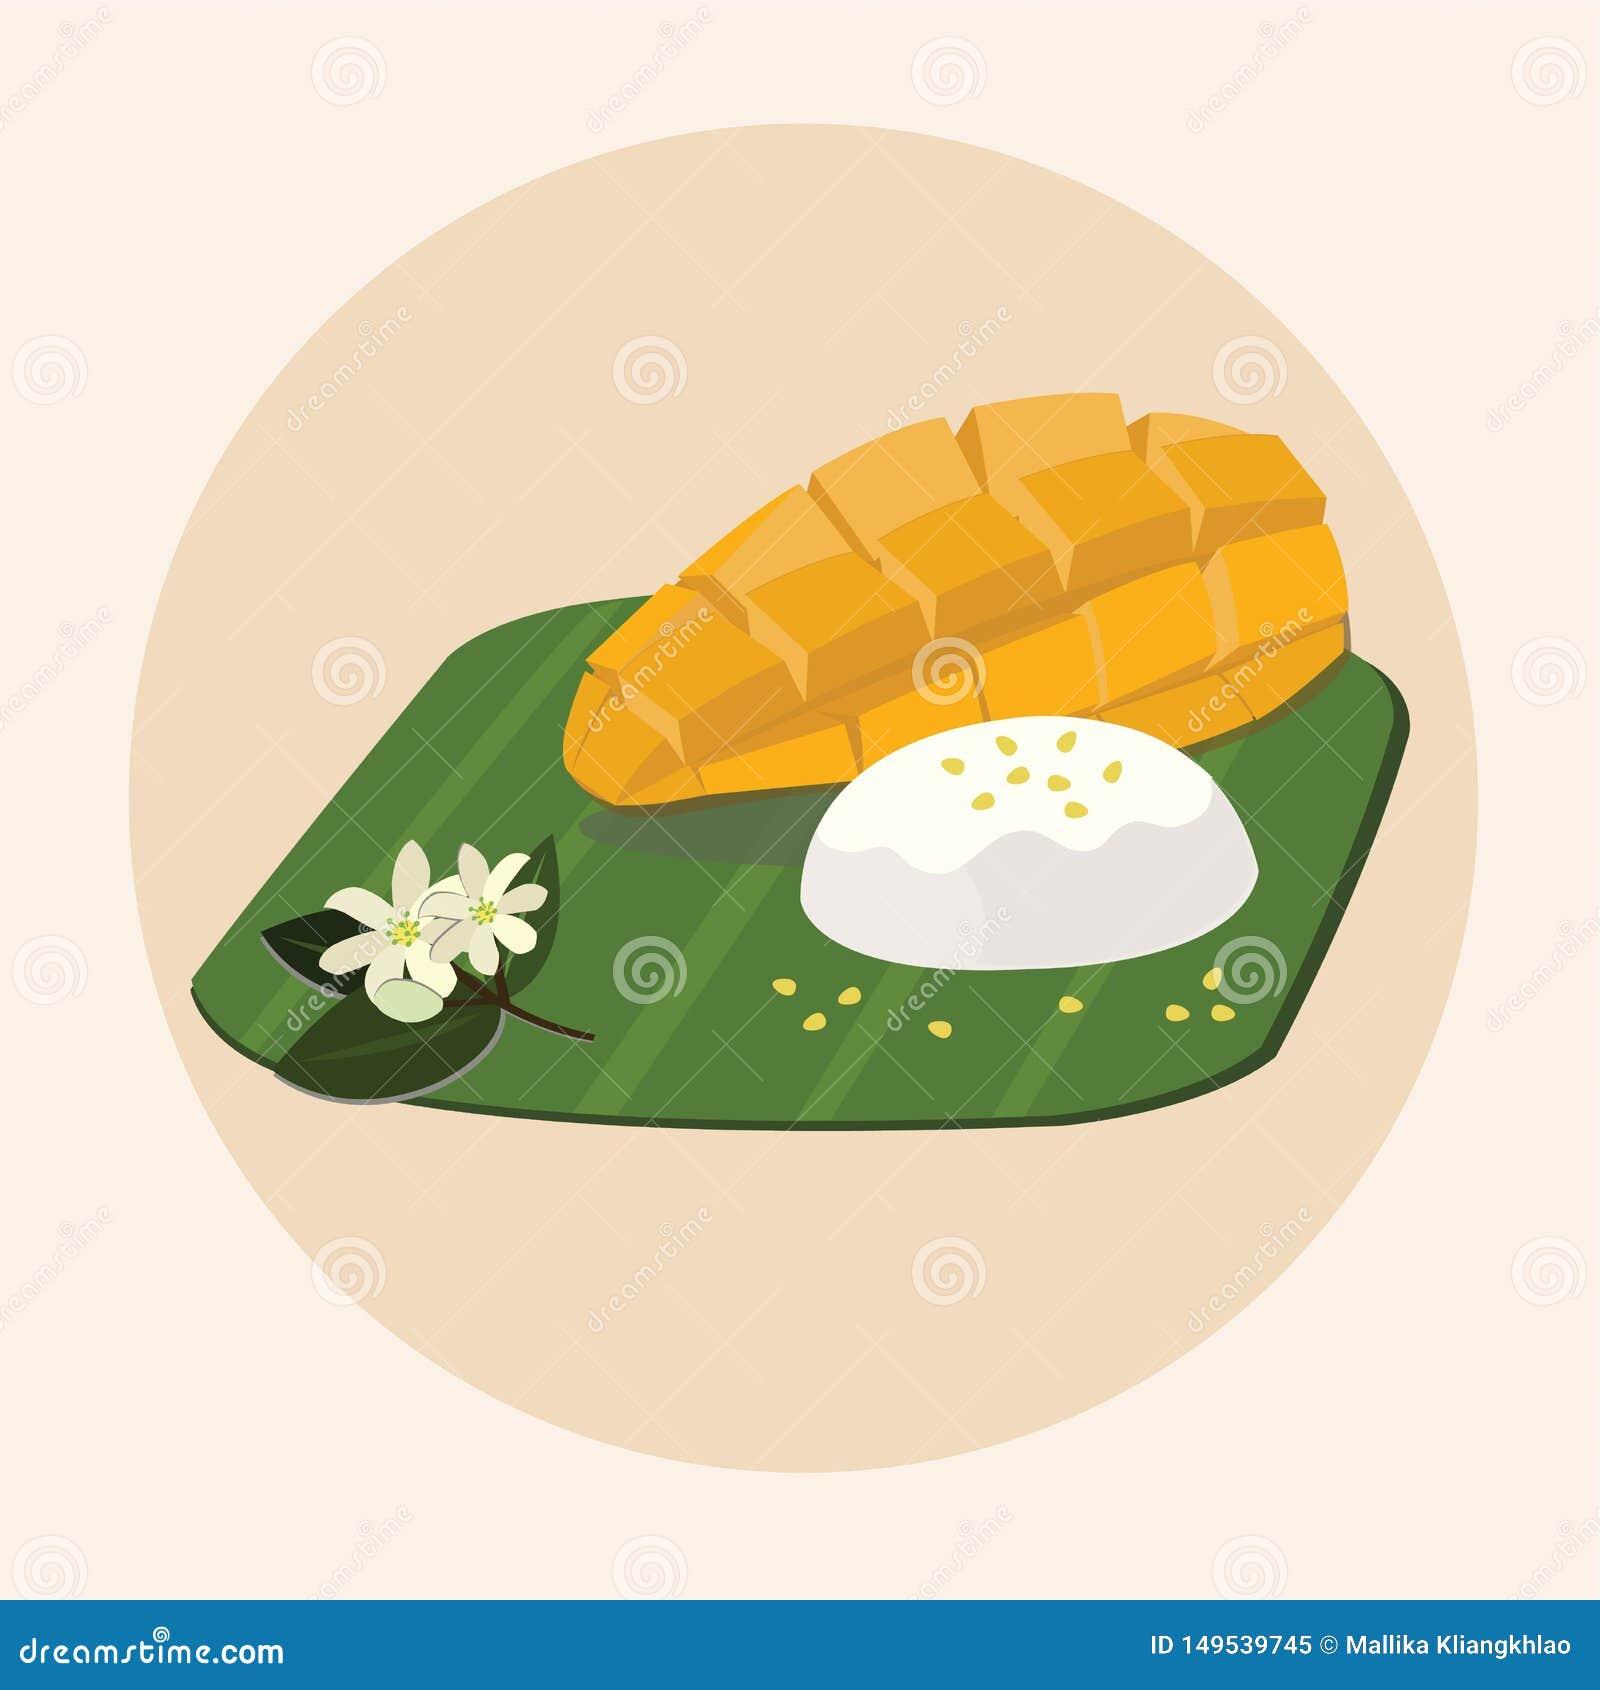 Khao Niew Ma Muang - Thaise Zoete Kleverige Rijst met Mango